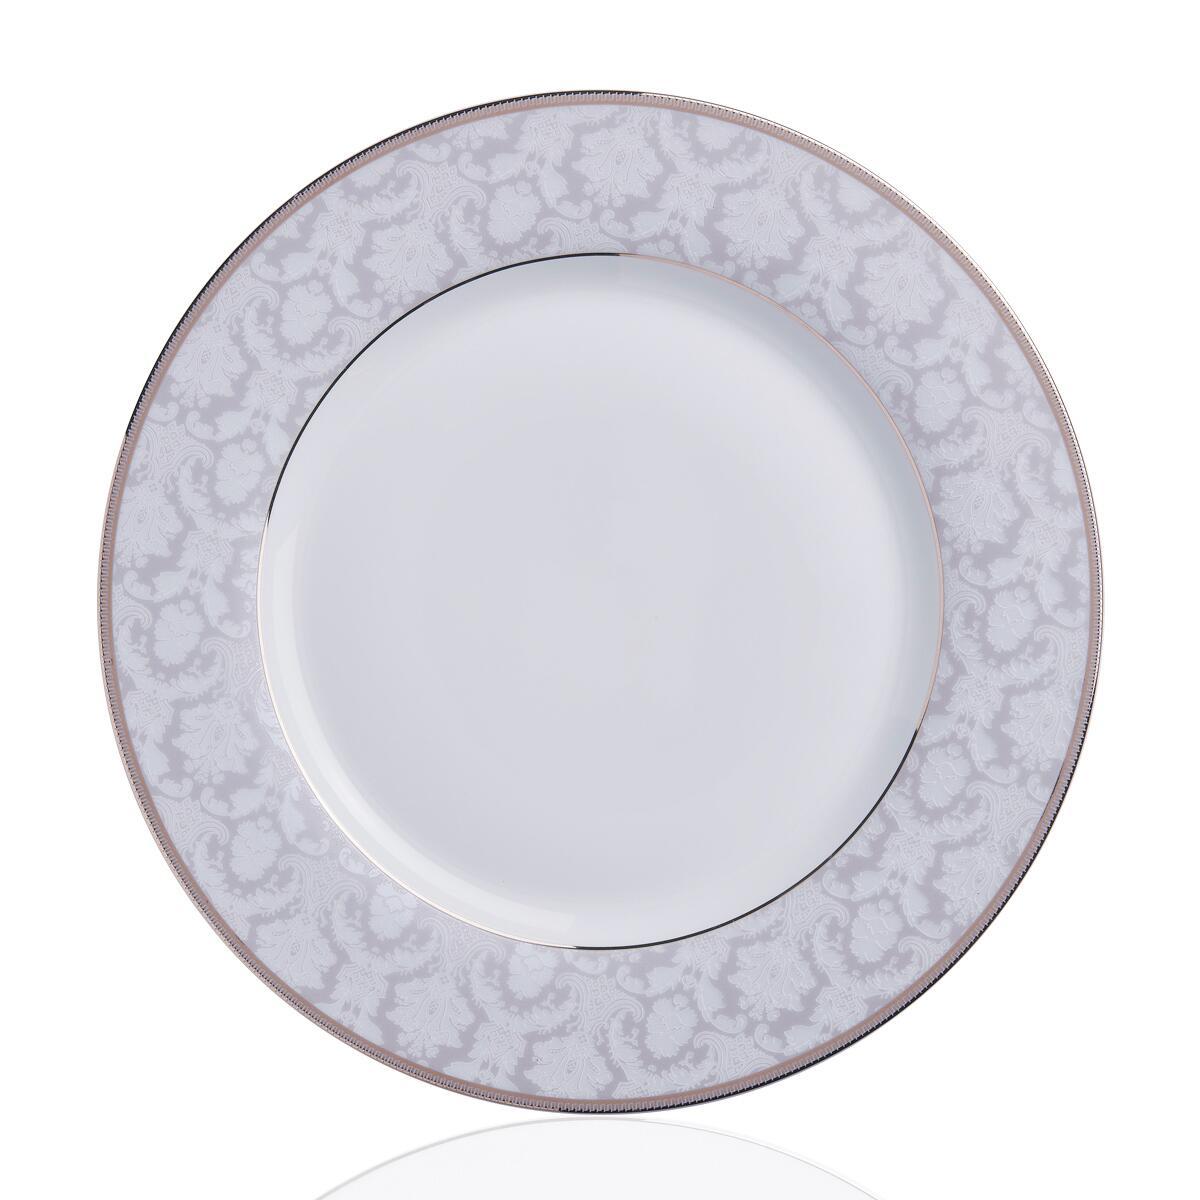 Korkmaz Super White 86 Parça Yuvarlak Yemek Takımı